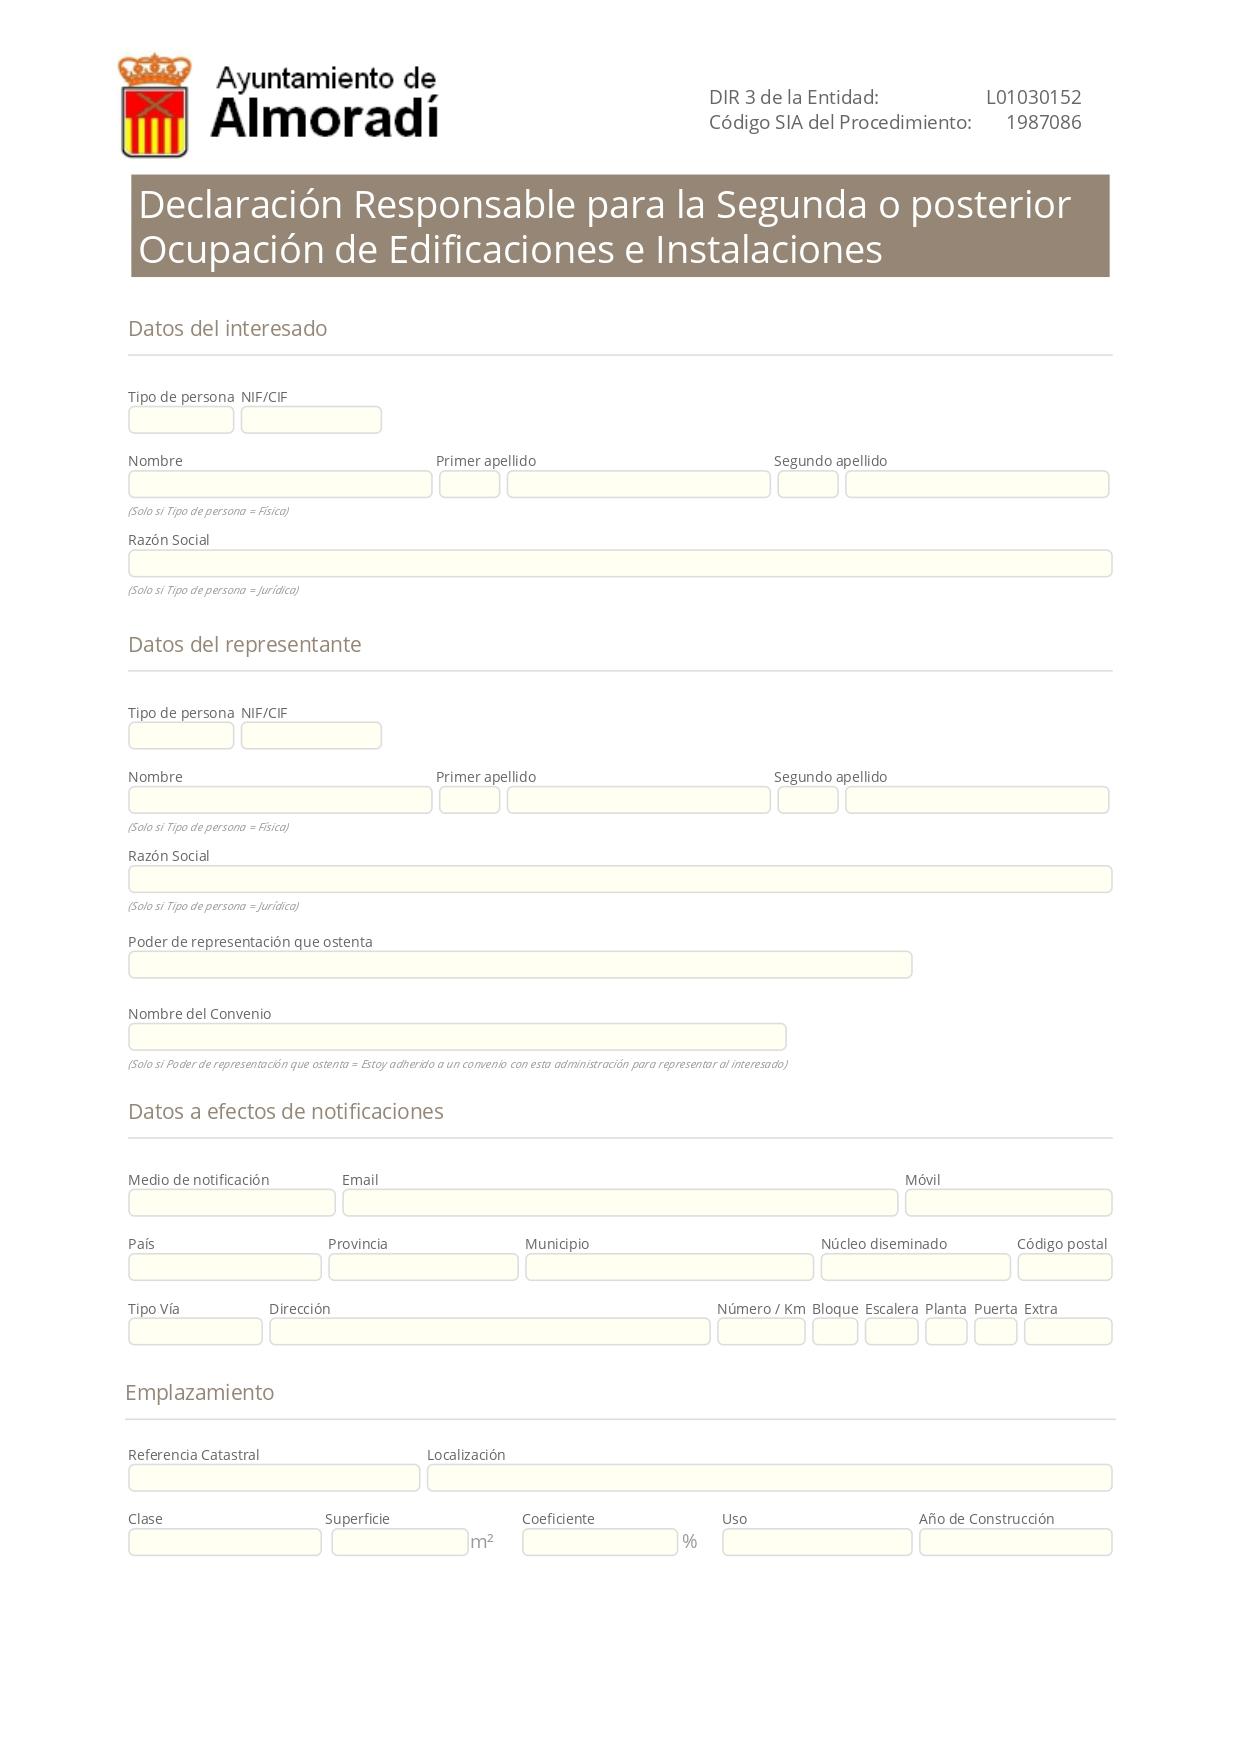 Declaración Responsable Segunda Ocupación Almoradí - Cédula de Habitabilidad Almoradí